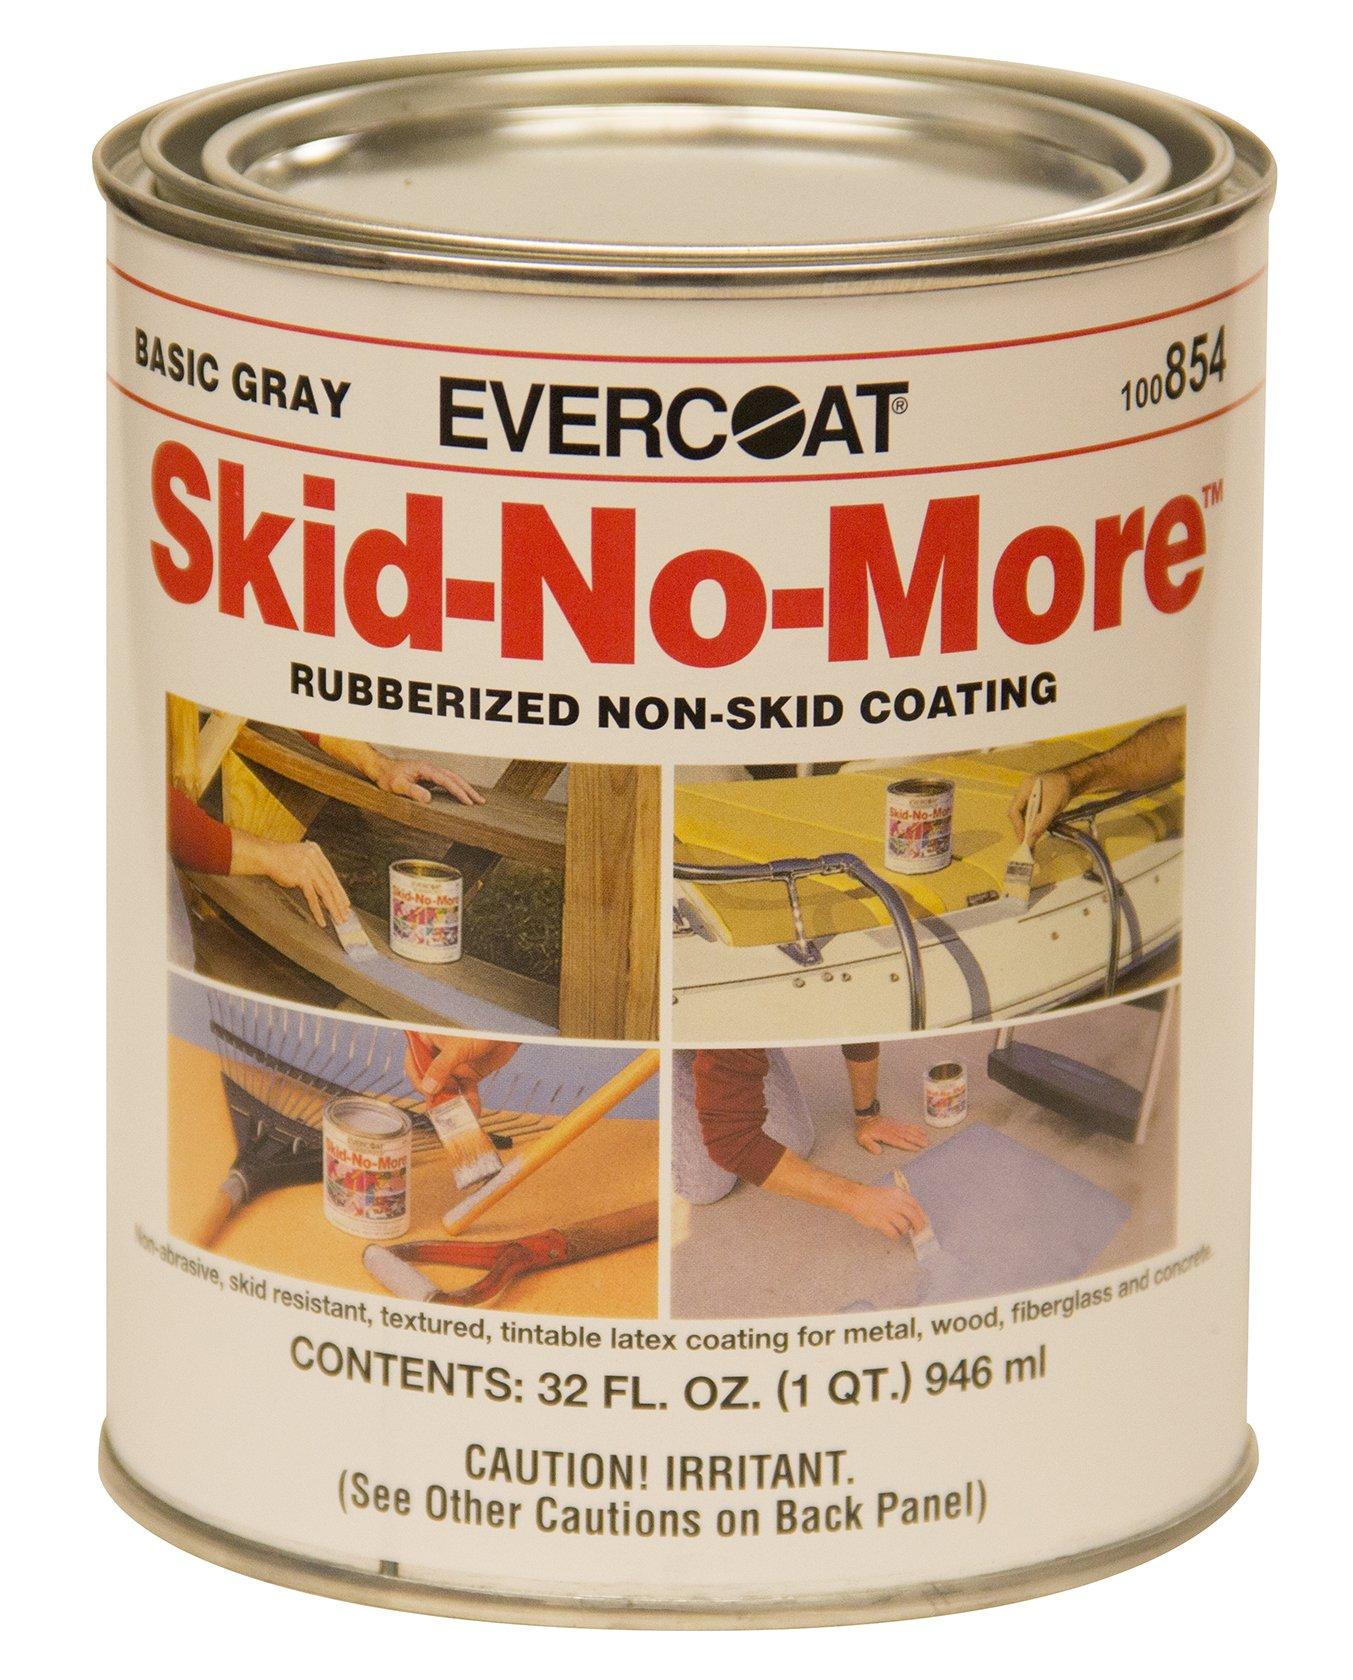 Evercoat 100854 Skid-No-More Rubberized Non-Skid Coating, 1 quart